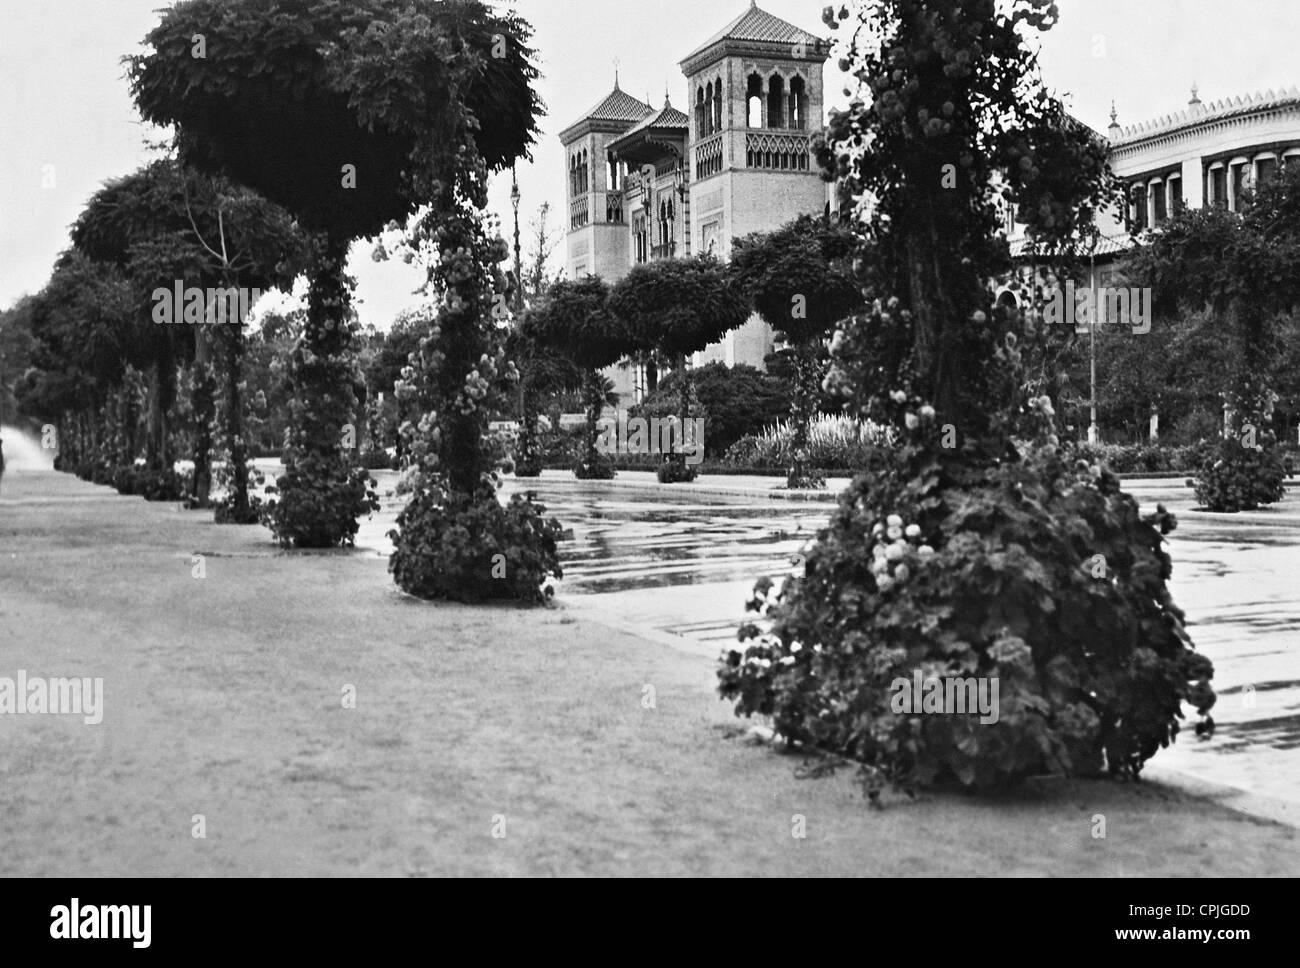 Lateinamerikanische Ausstellung in Sevilla, 1929 Stockbild